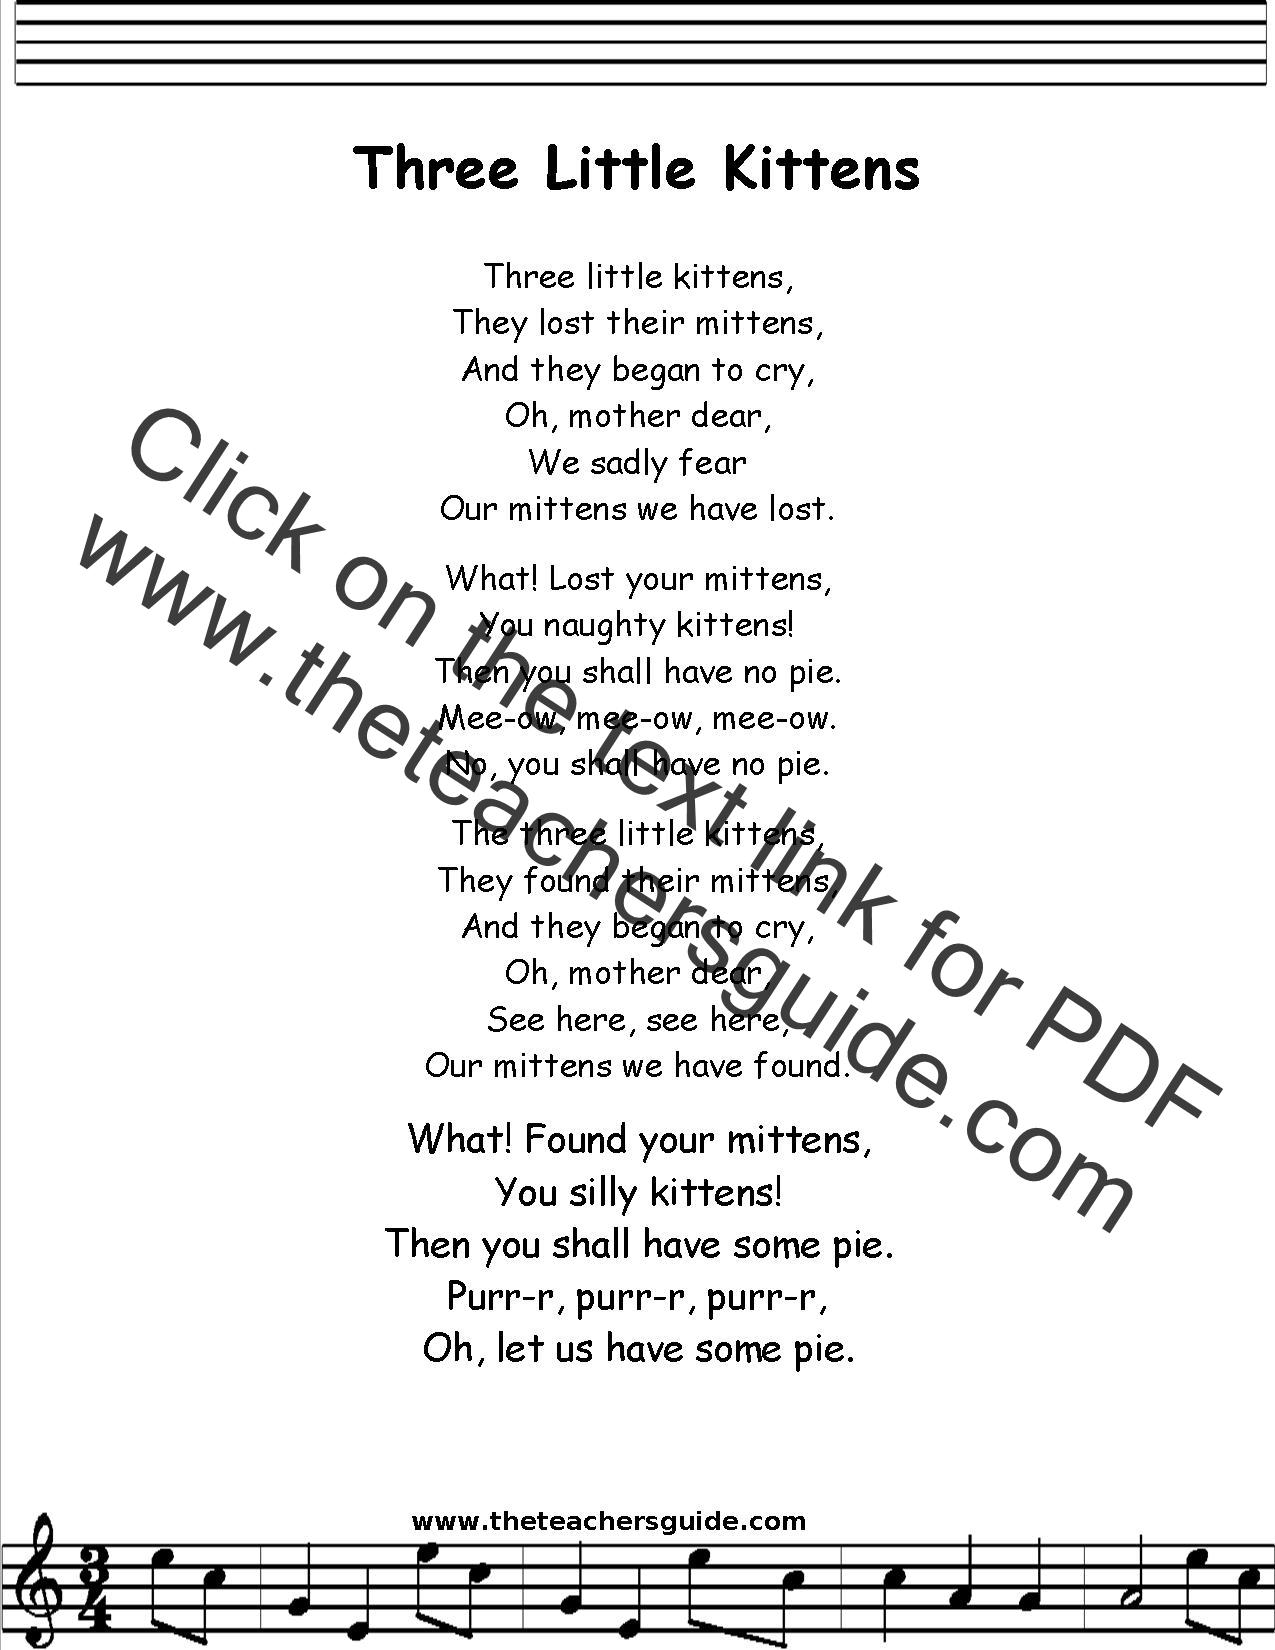 Three Little Kittens Lyrics Printout Midi And Video